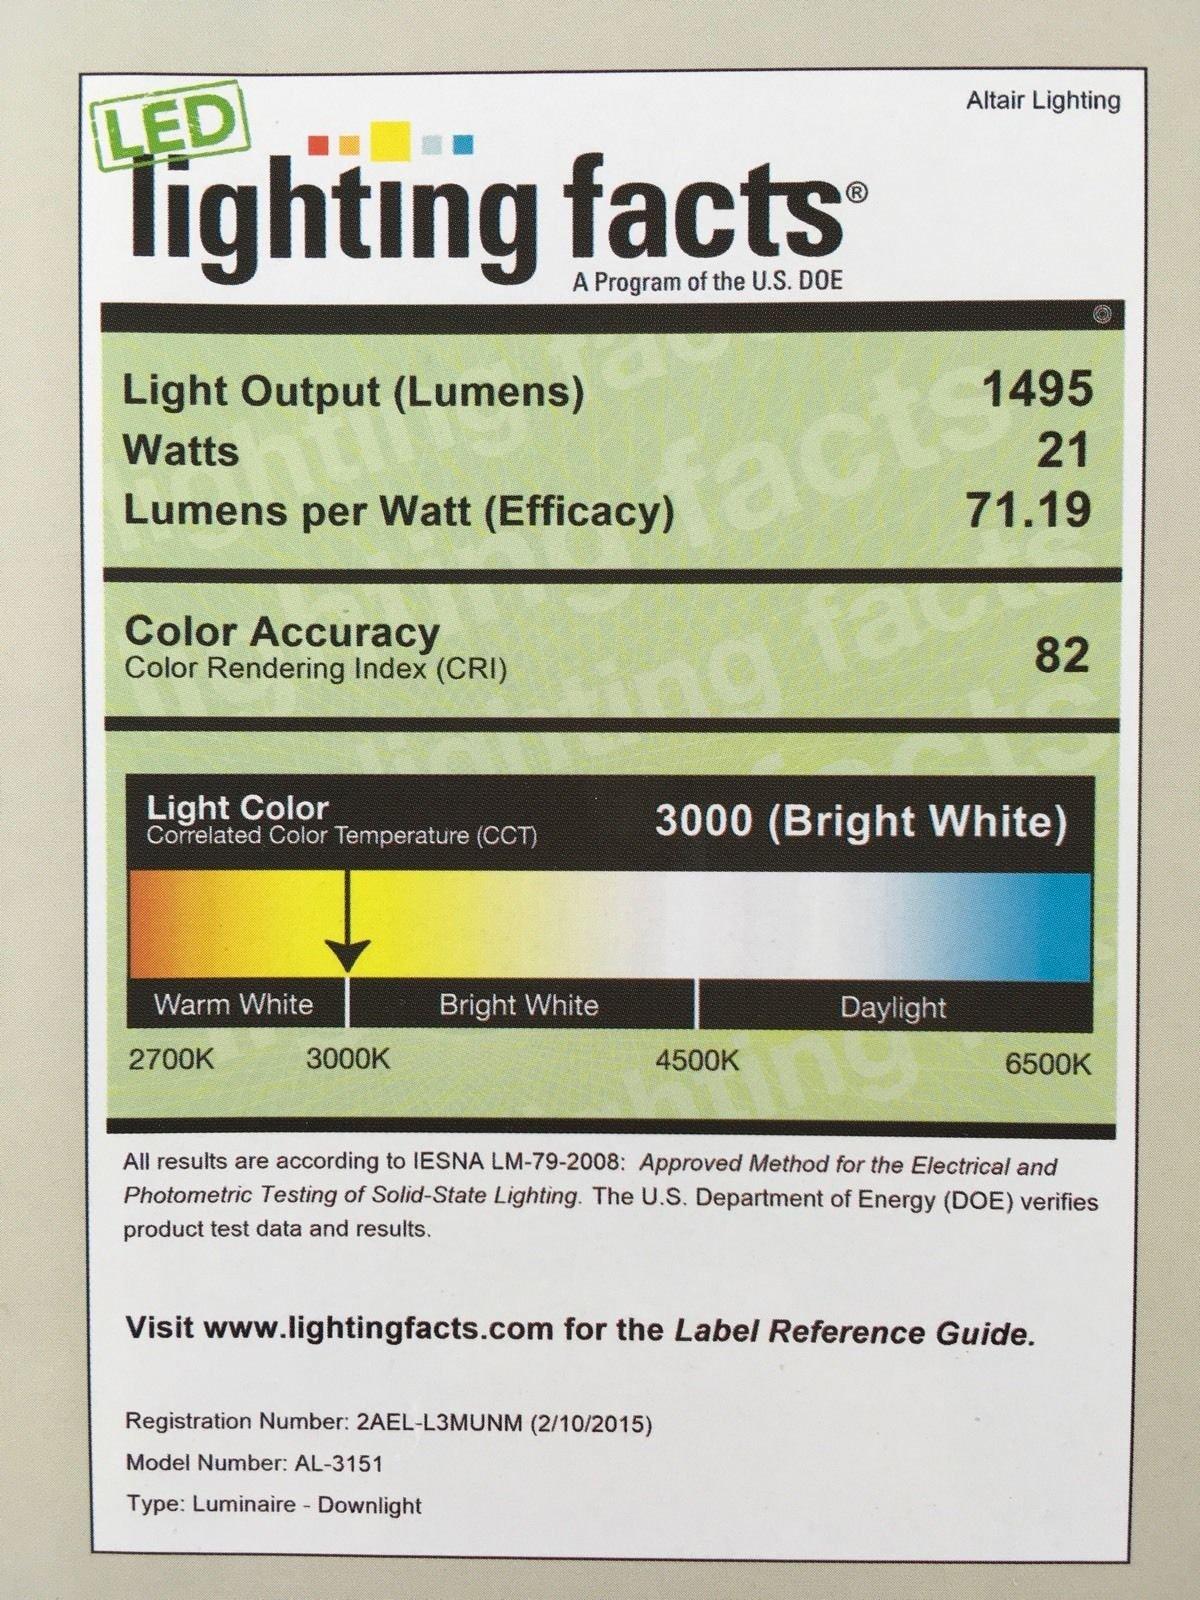 21W Altair Lighting LED 14-Inch Flush mount Decorative Light Fixture 120w